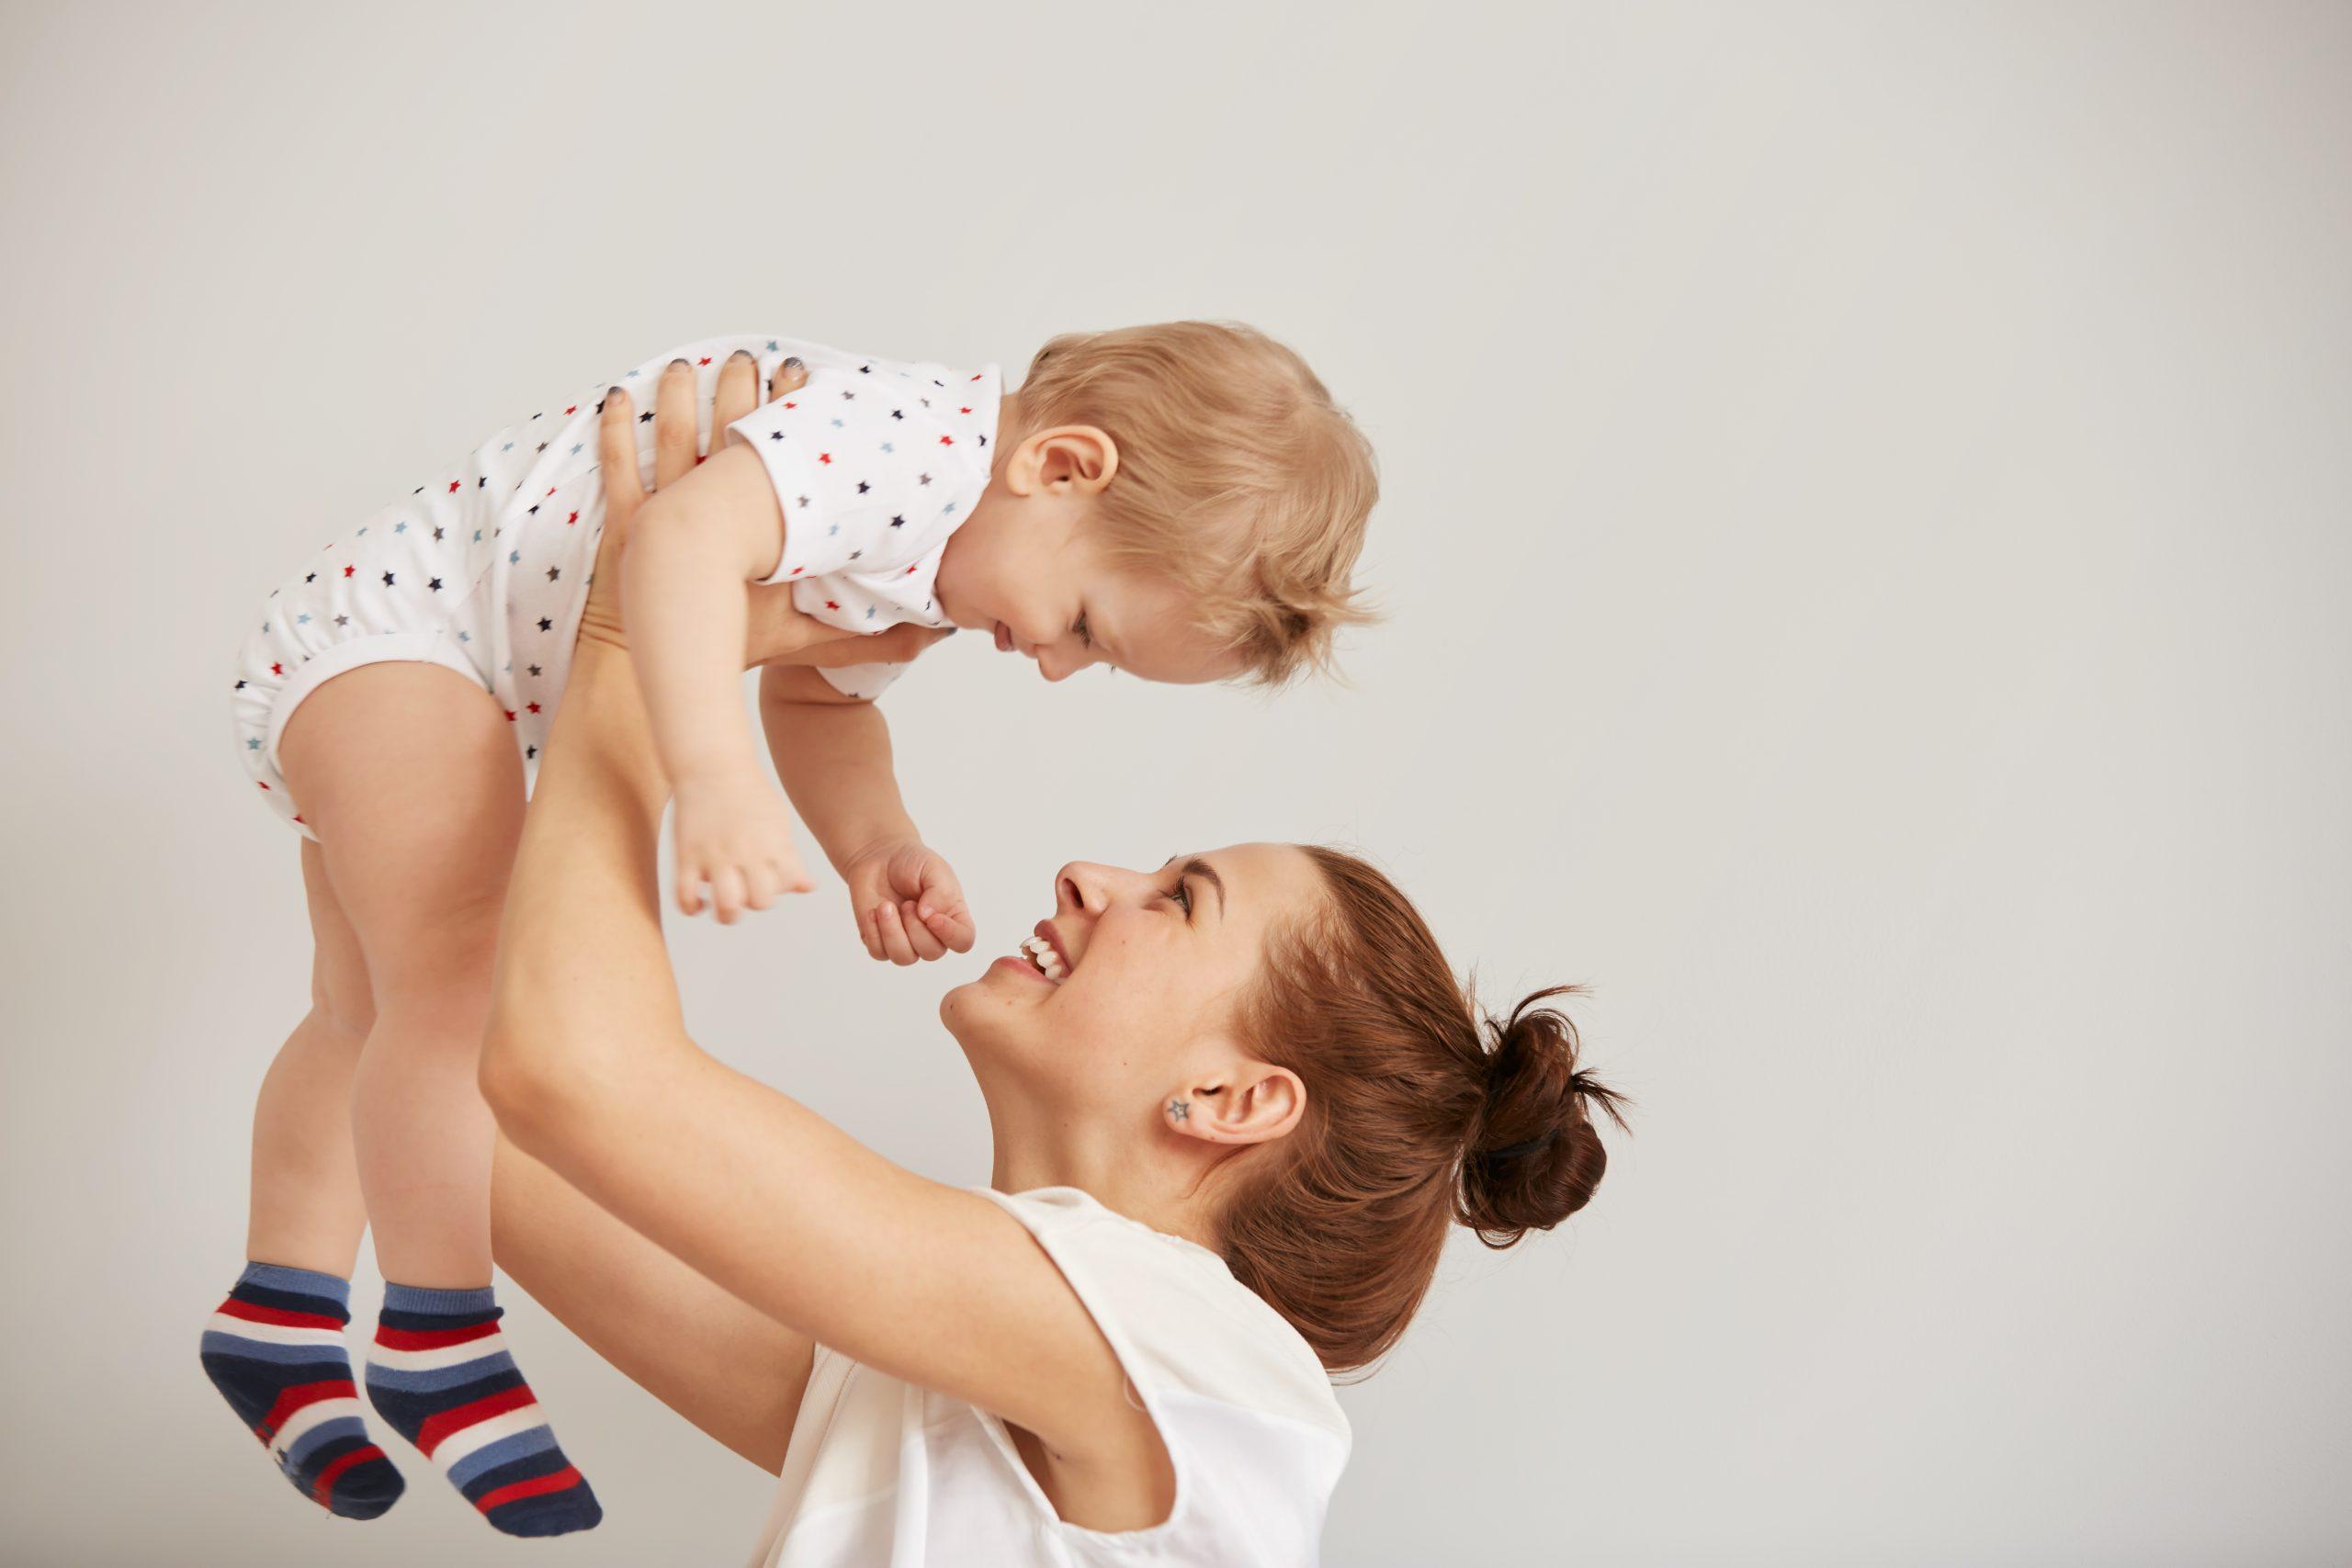 Activities for New Moms